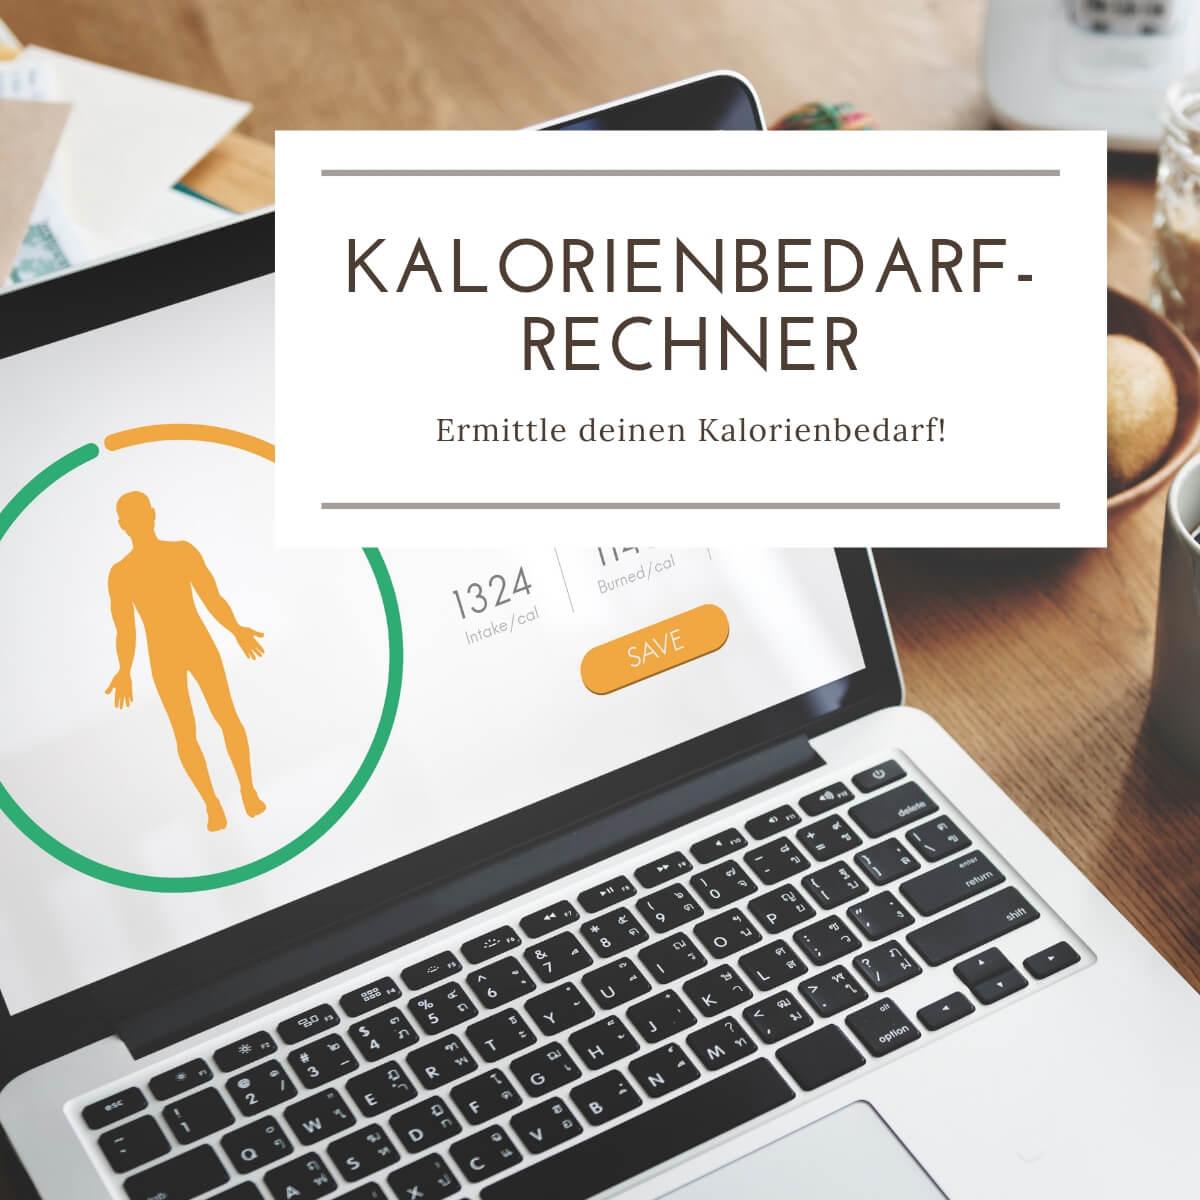 Kalorienbedarfrechner